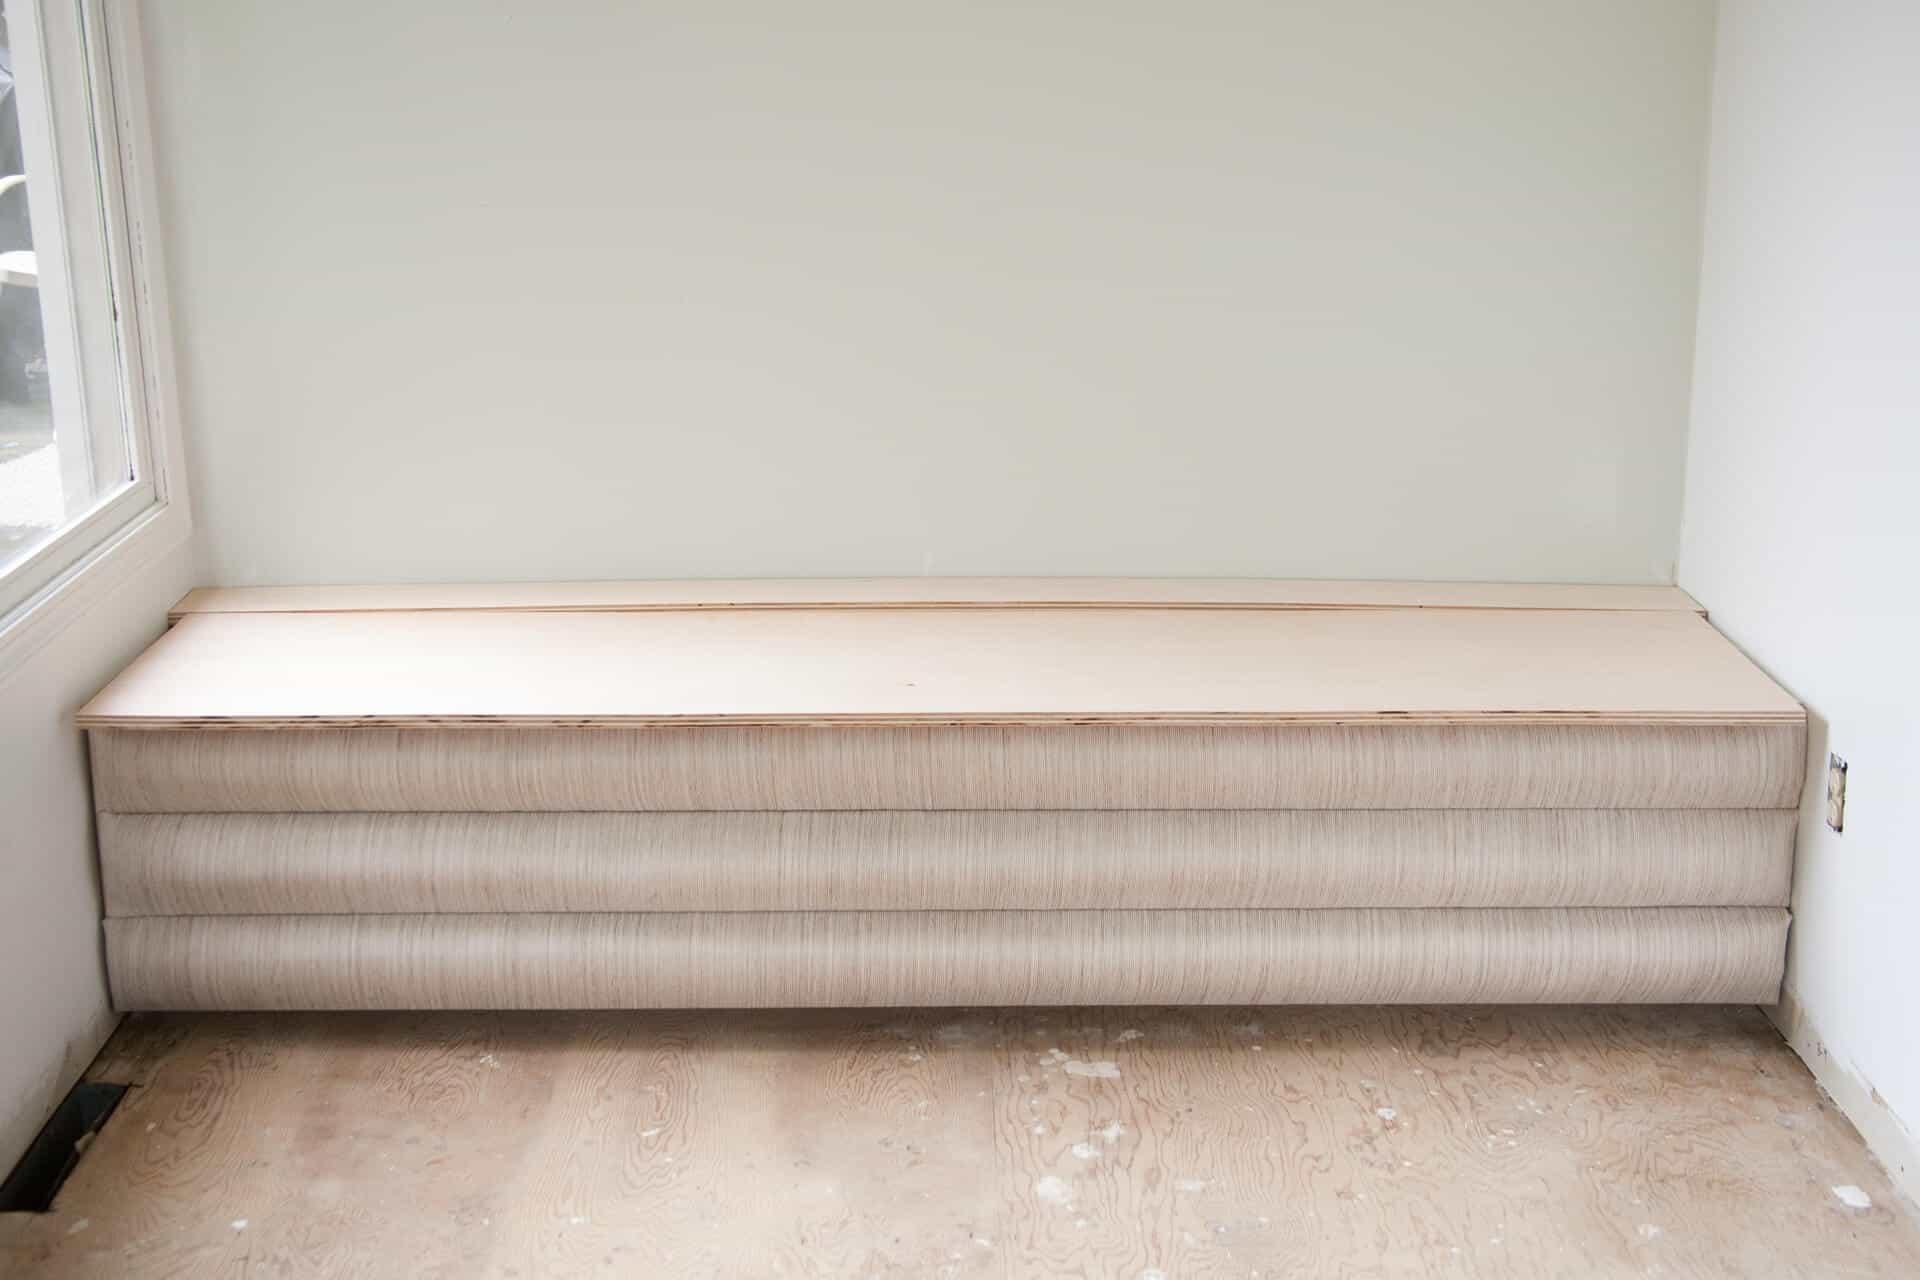 DIY channel tufted storage bench